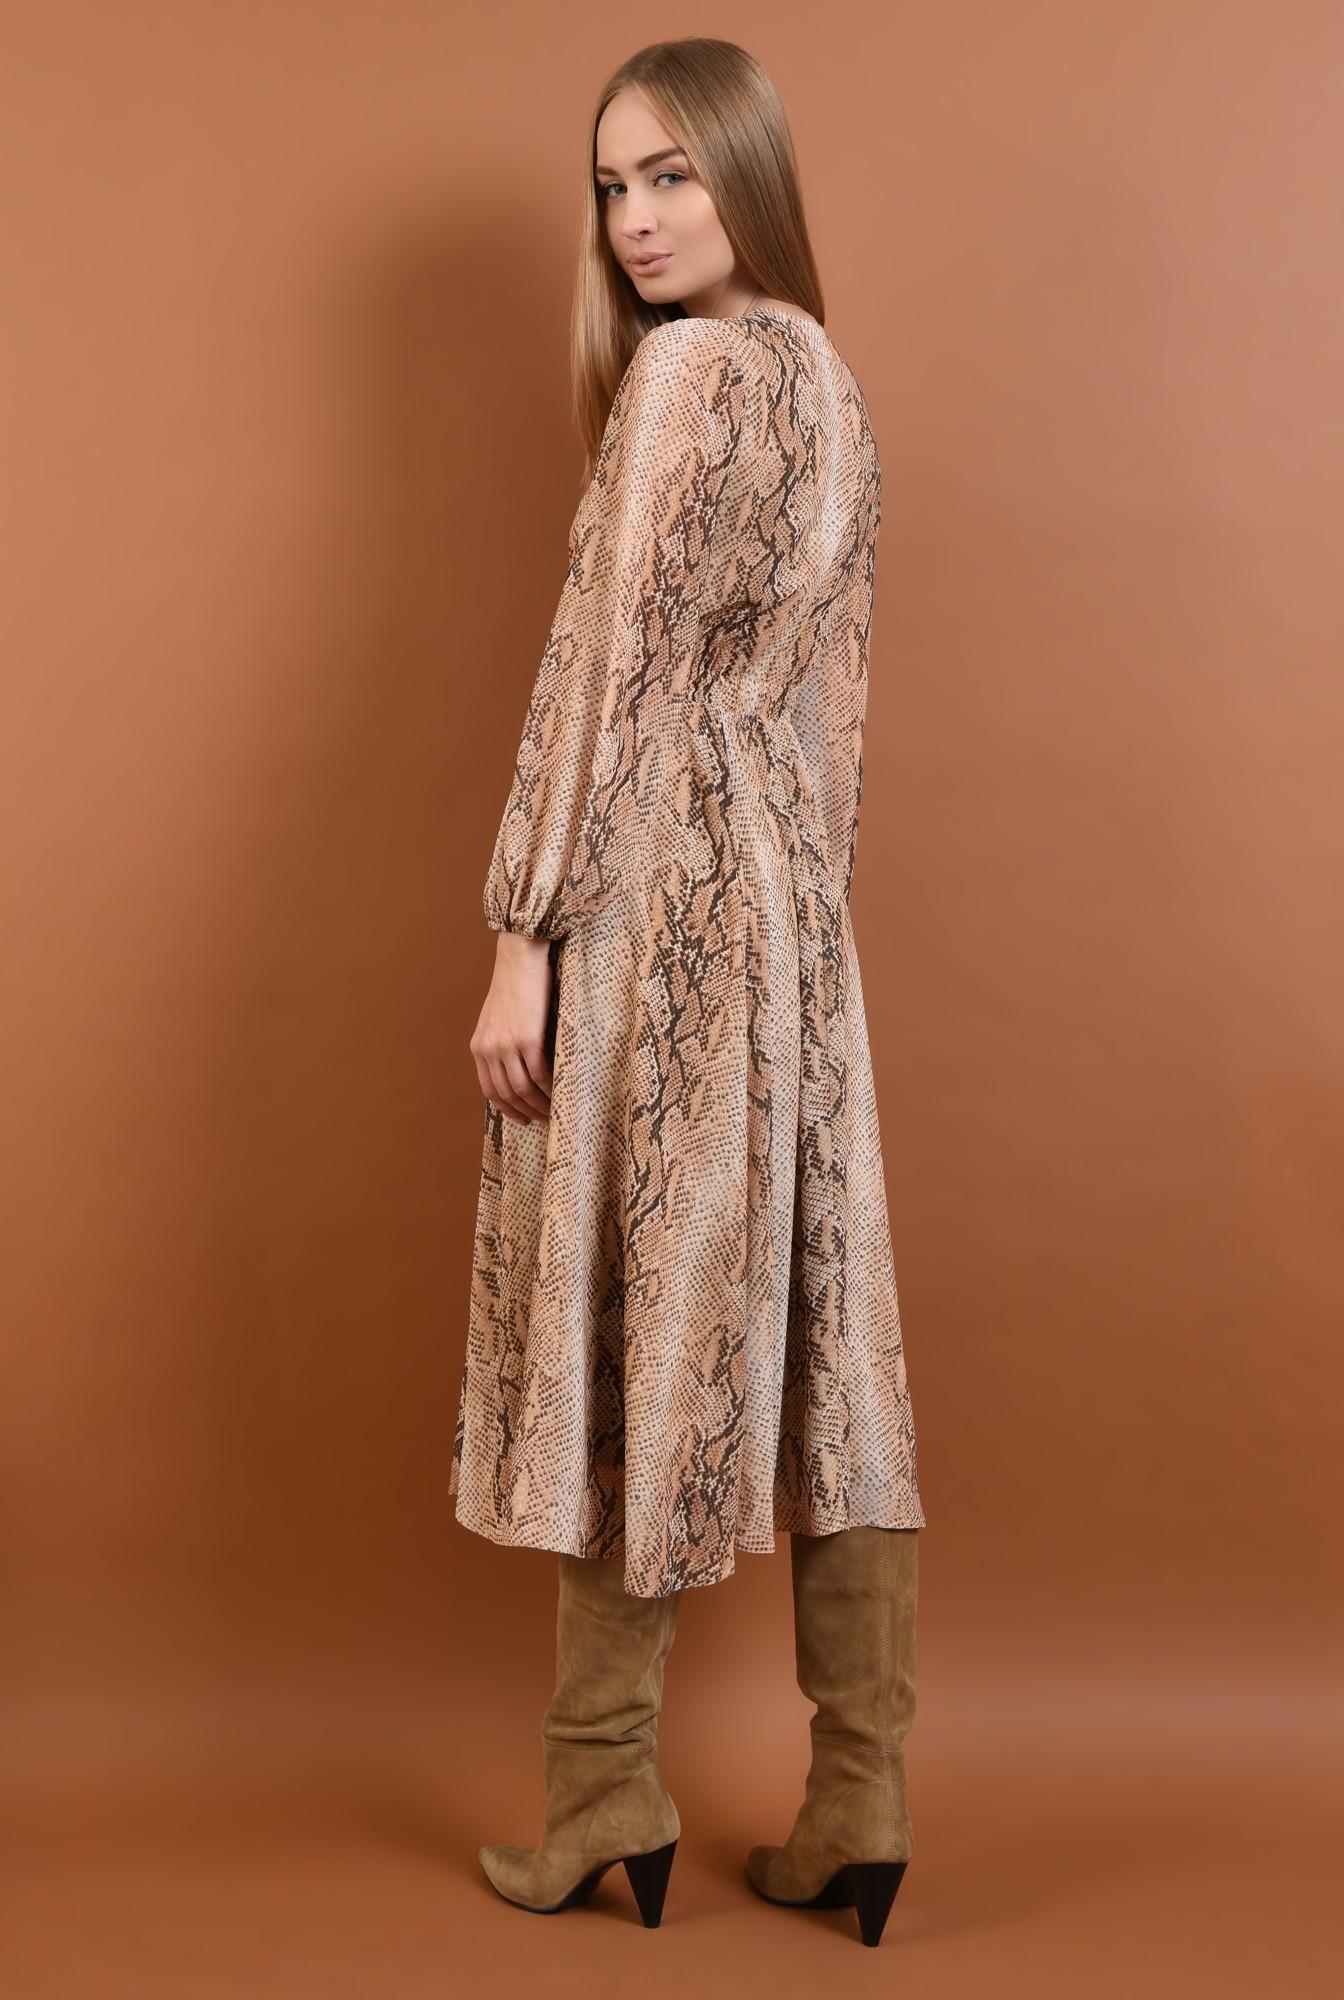 1 - 360 - rochie eleganta, de zi, din voal, imprimata, sarpe, maneci lungi, esarfa